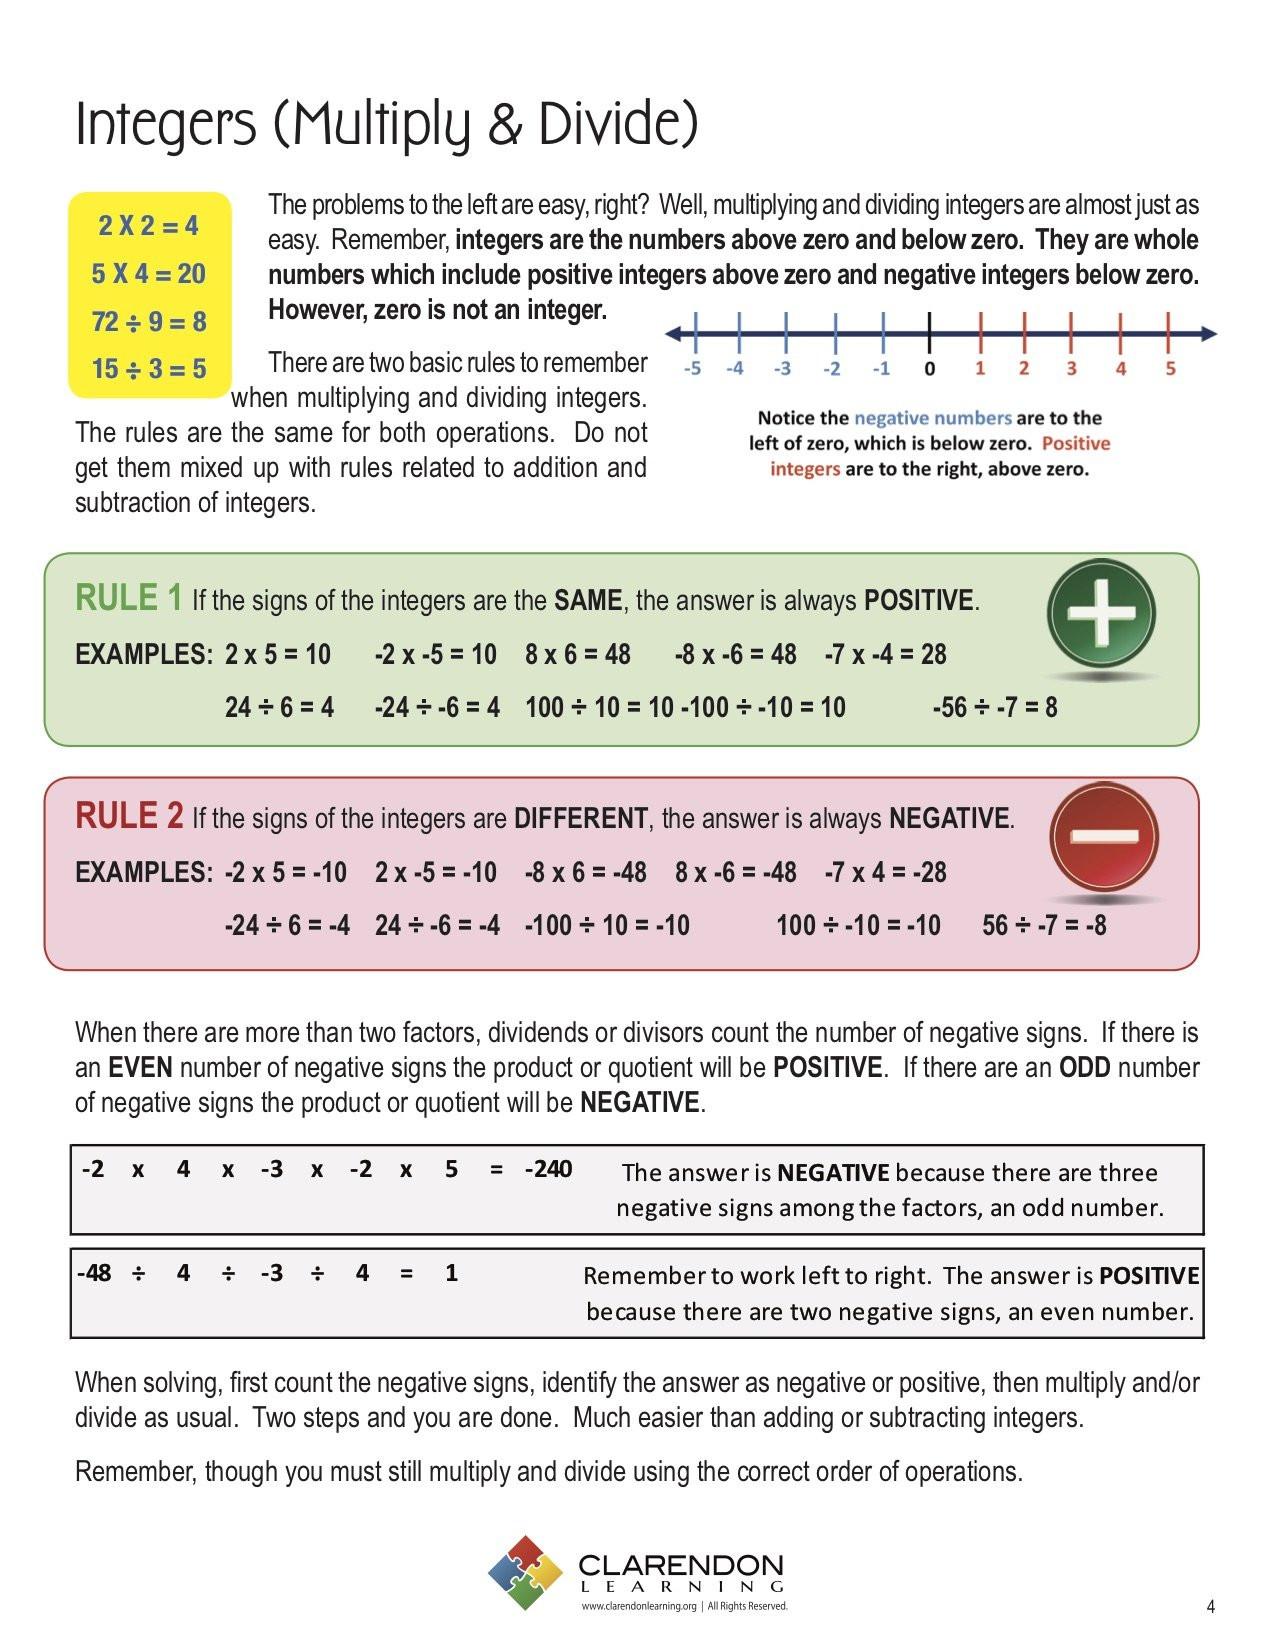 Multiplication Of Integers Worksheet Integers Multiply & Divide Lesson Plan